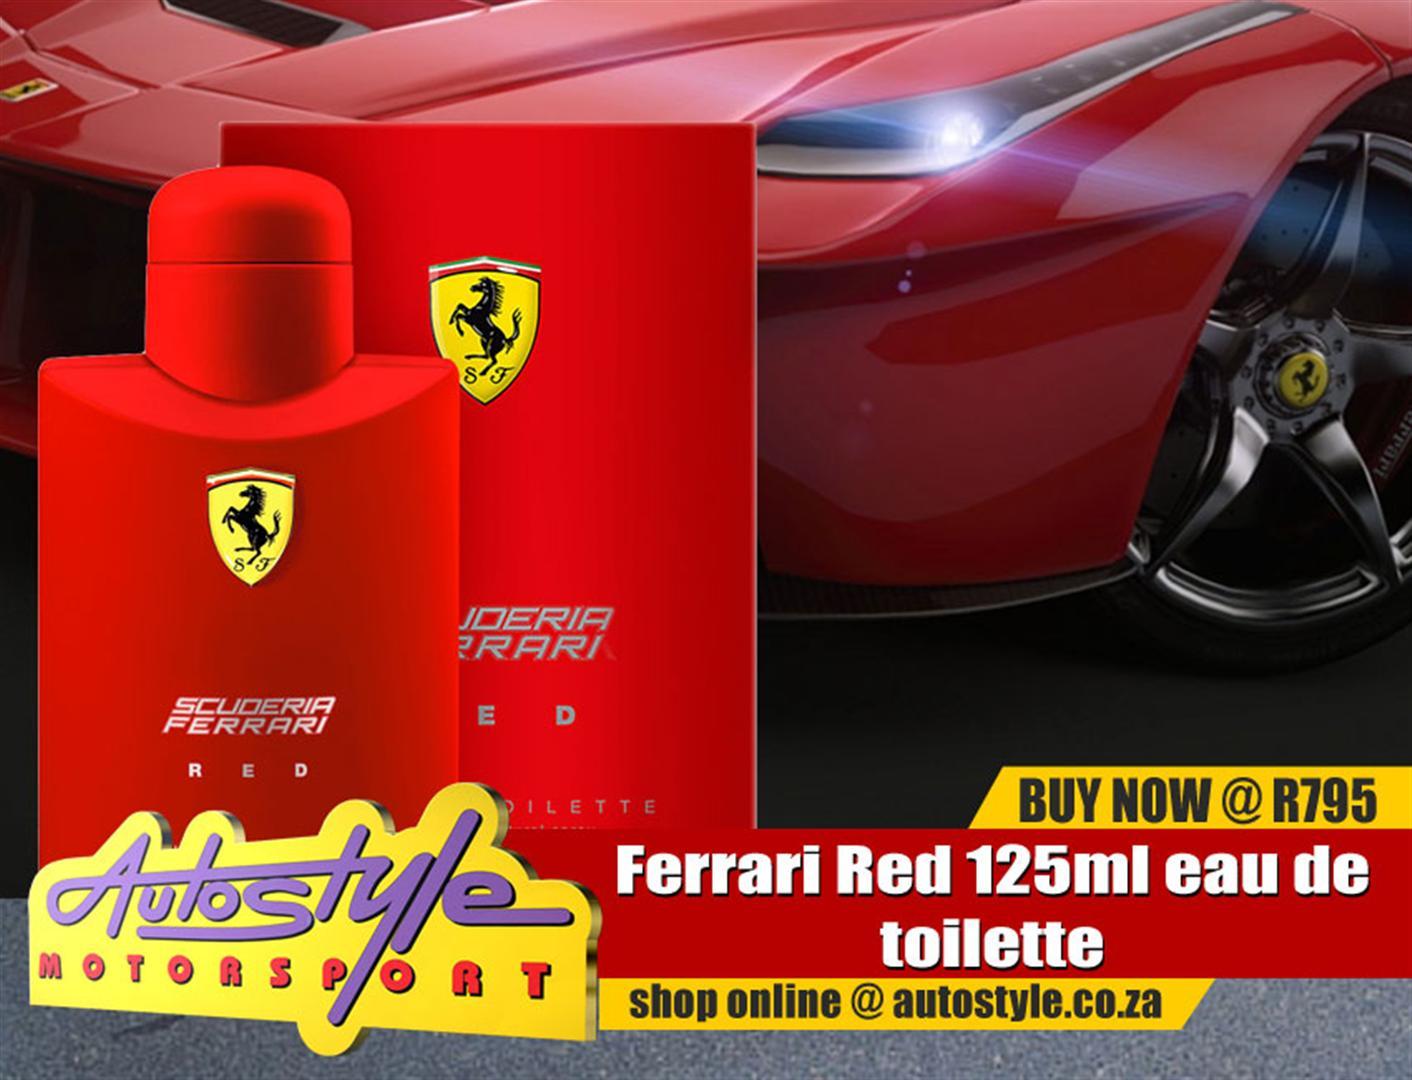 Ferrari Red 125ml eau de toilette